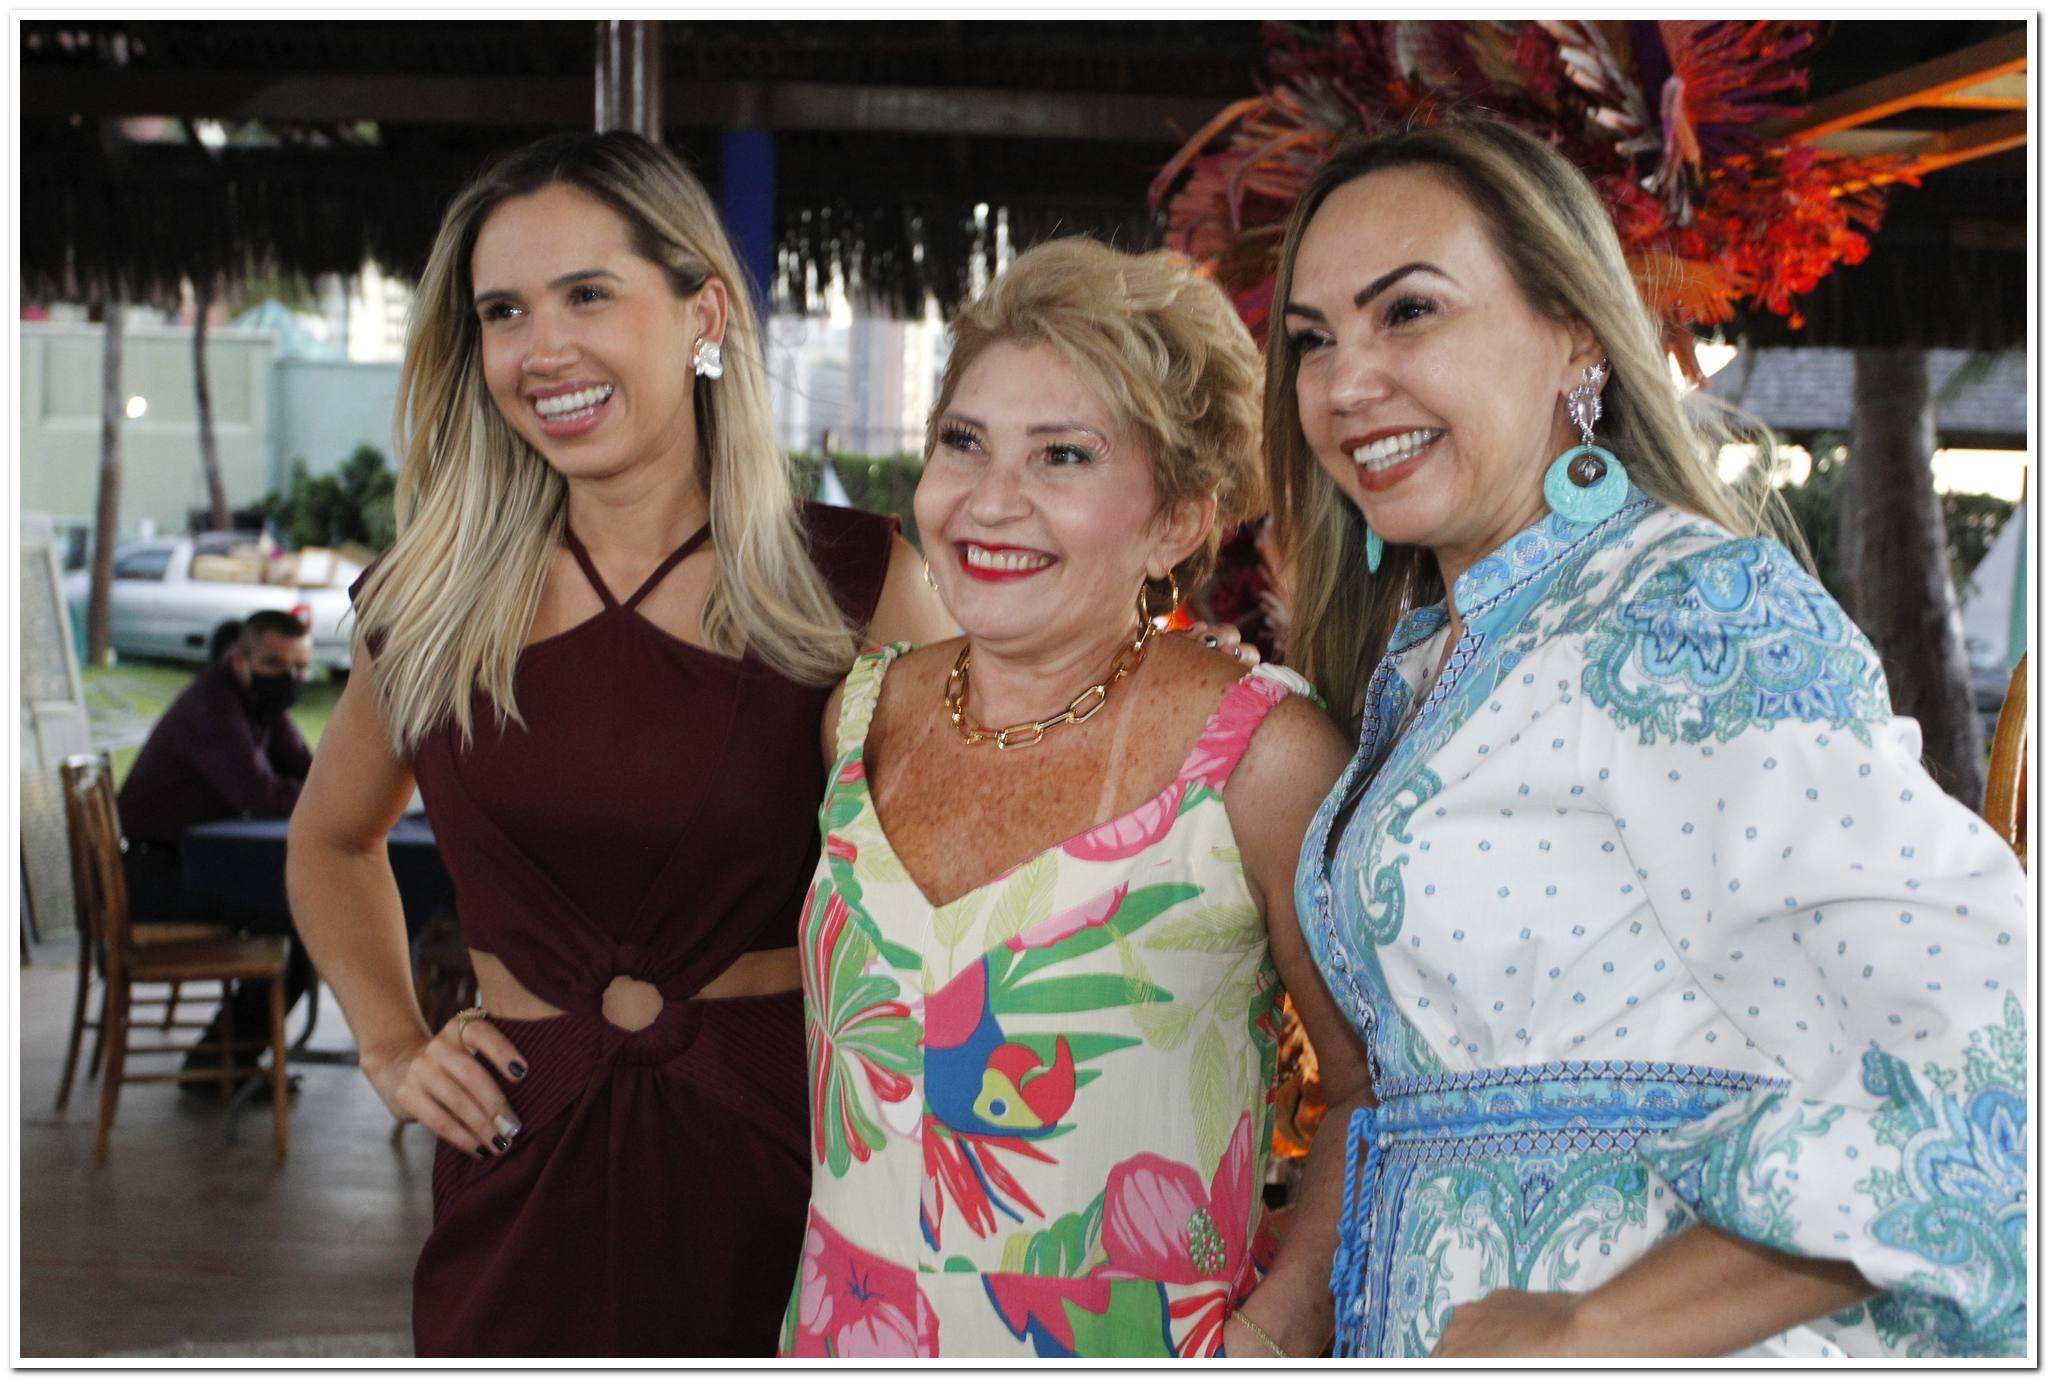 Nayana Ataide, Salete Araujo E Adriana Ataide